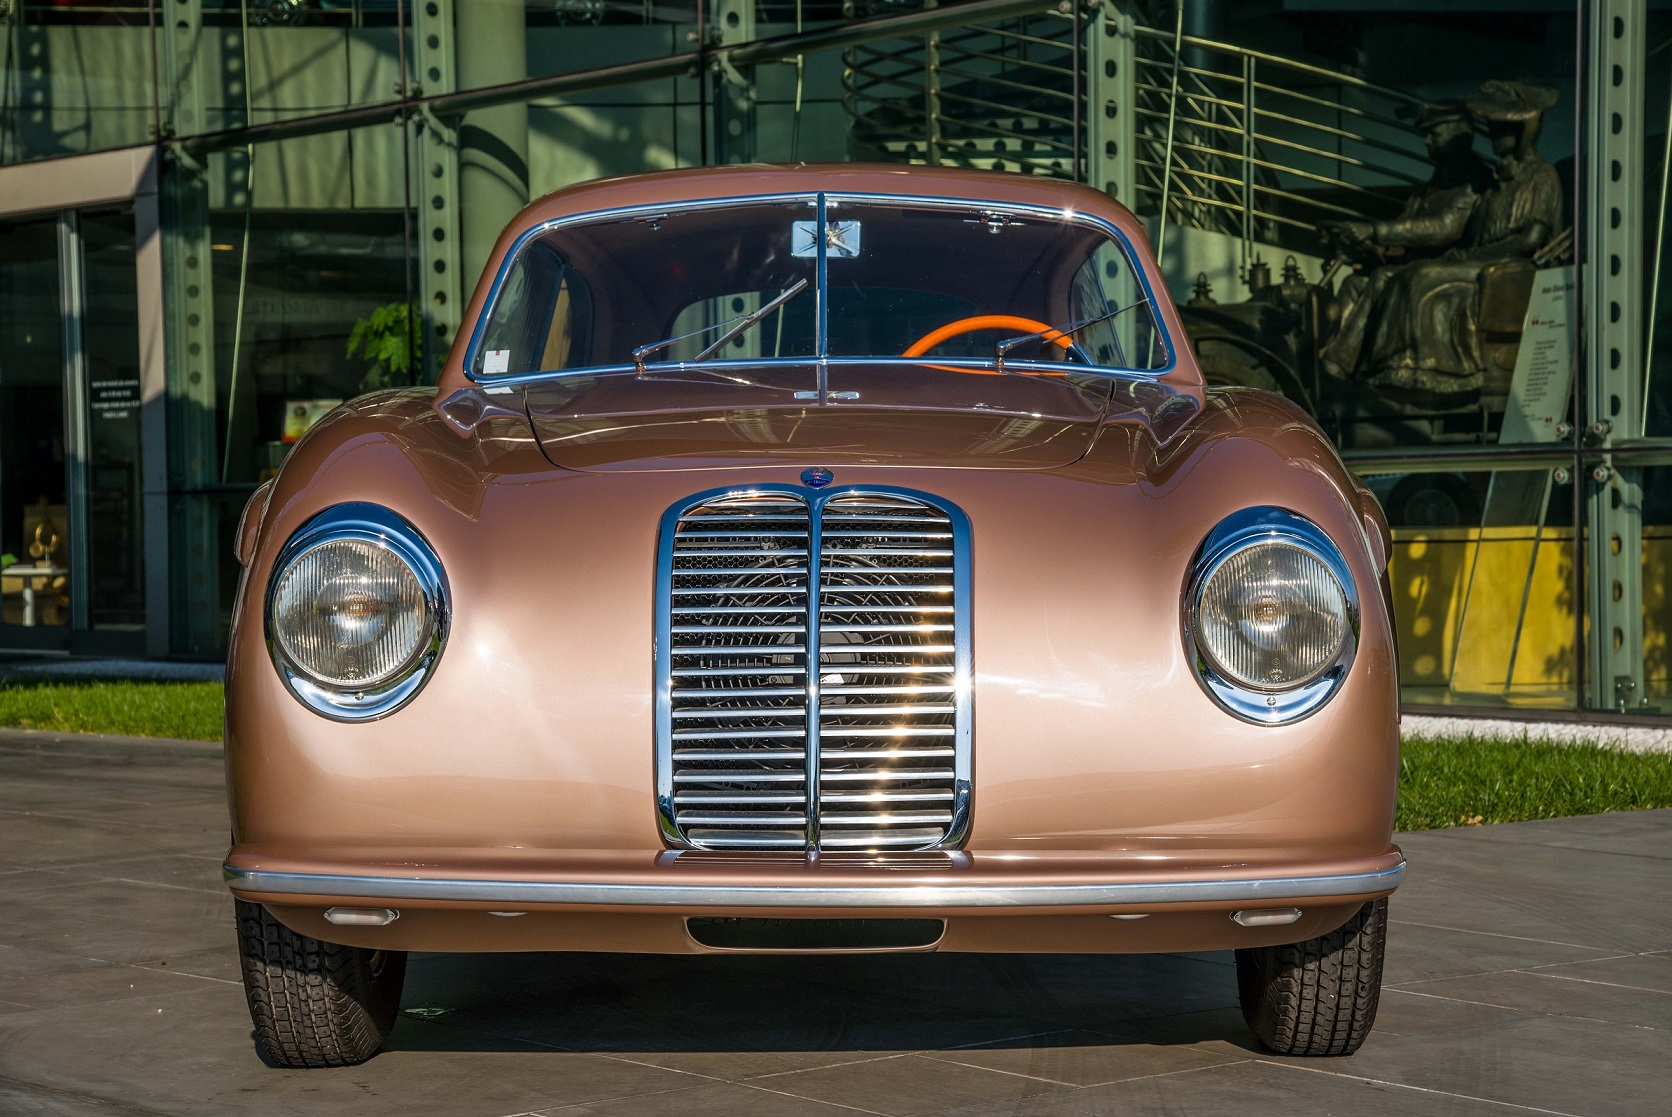 Oldtimer aus dem Nicolis Museum gehören zu den Stars des Maserati FuoriSerie-Shootings